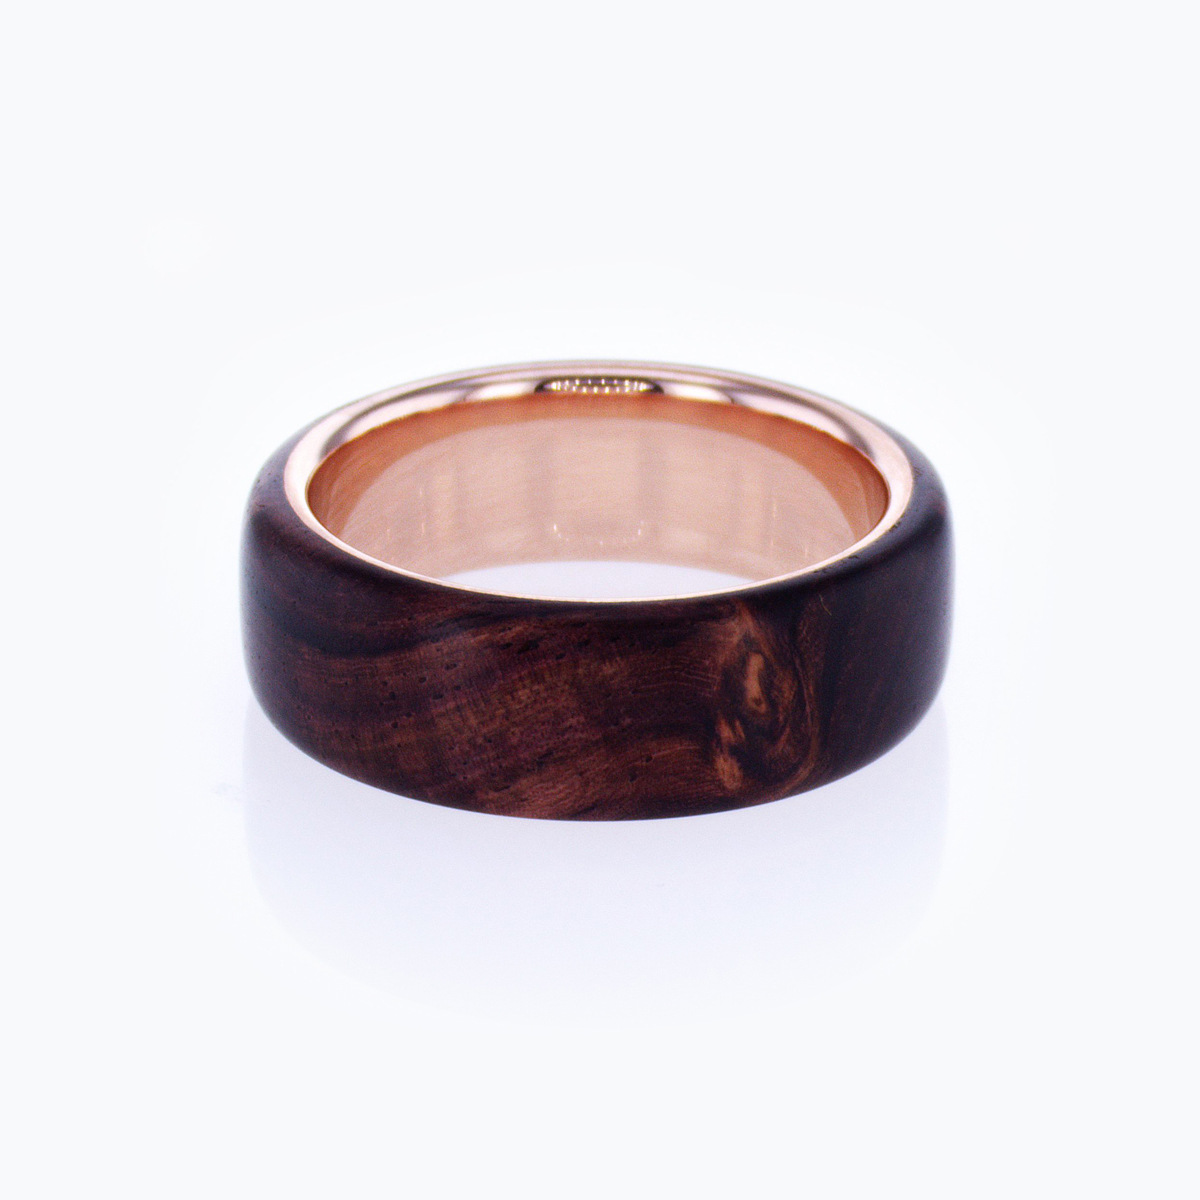 Burlwood Men's Wedding Ring with 14k Rose Gold Base